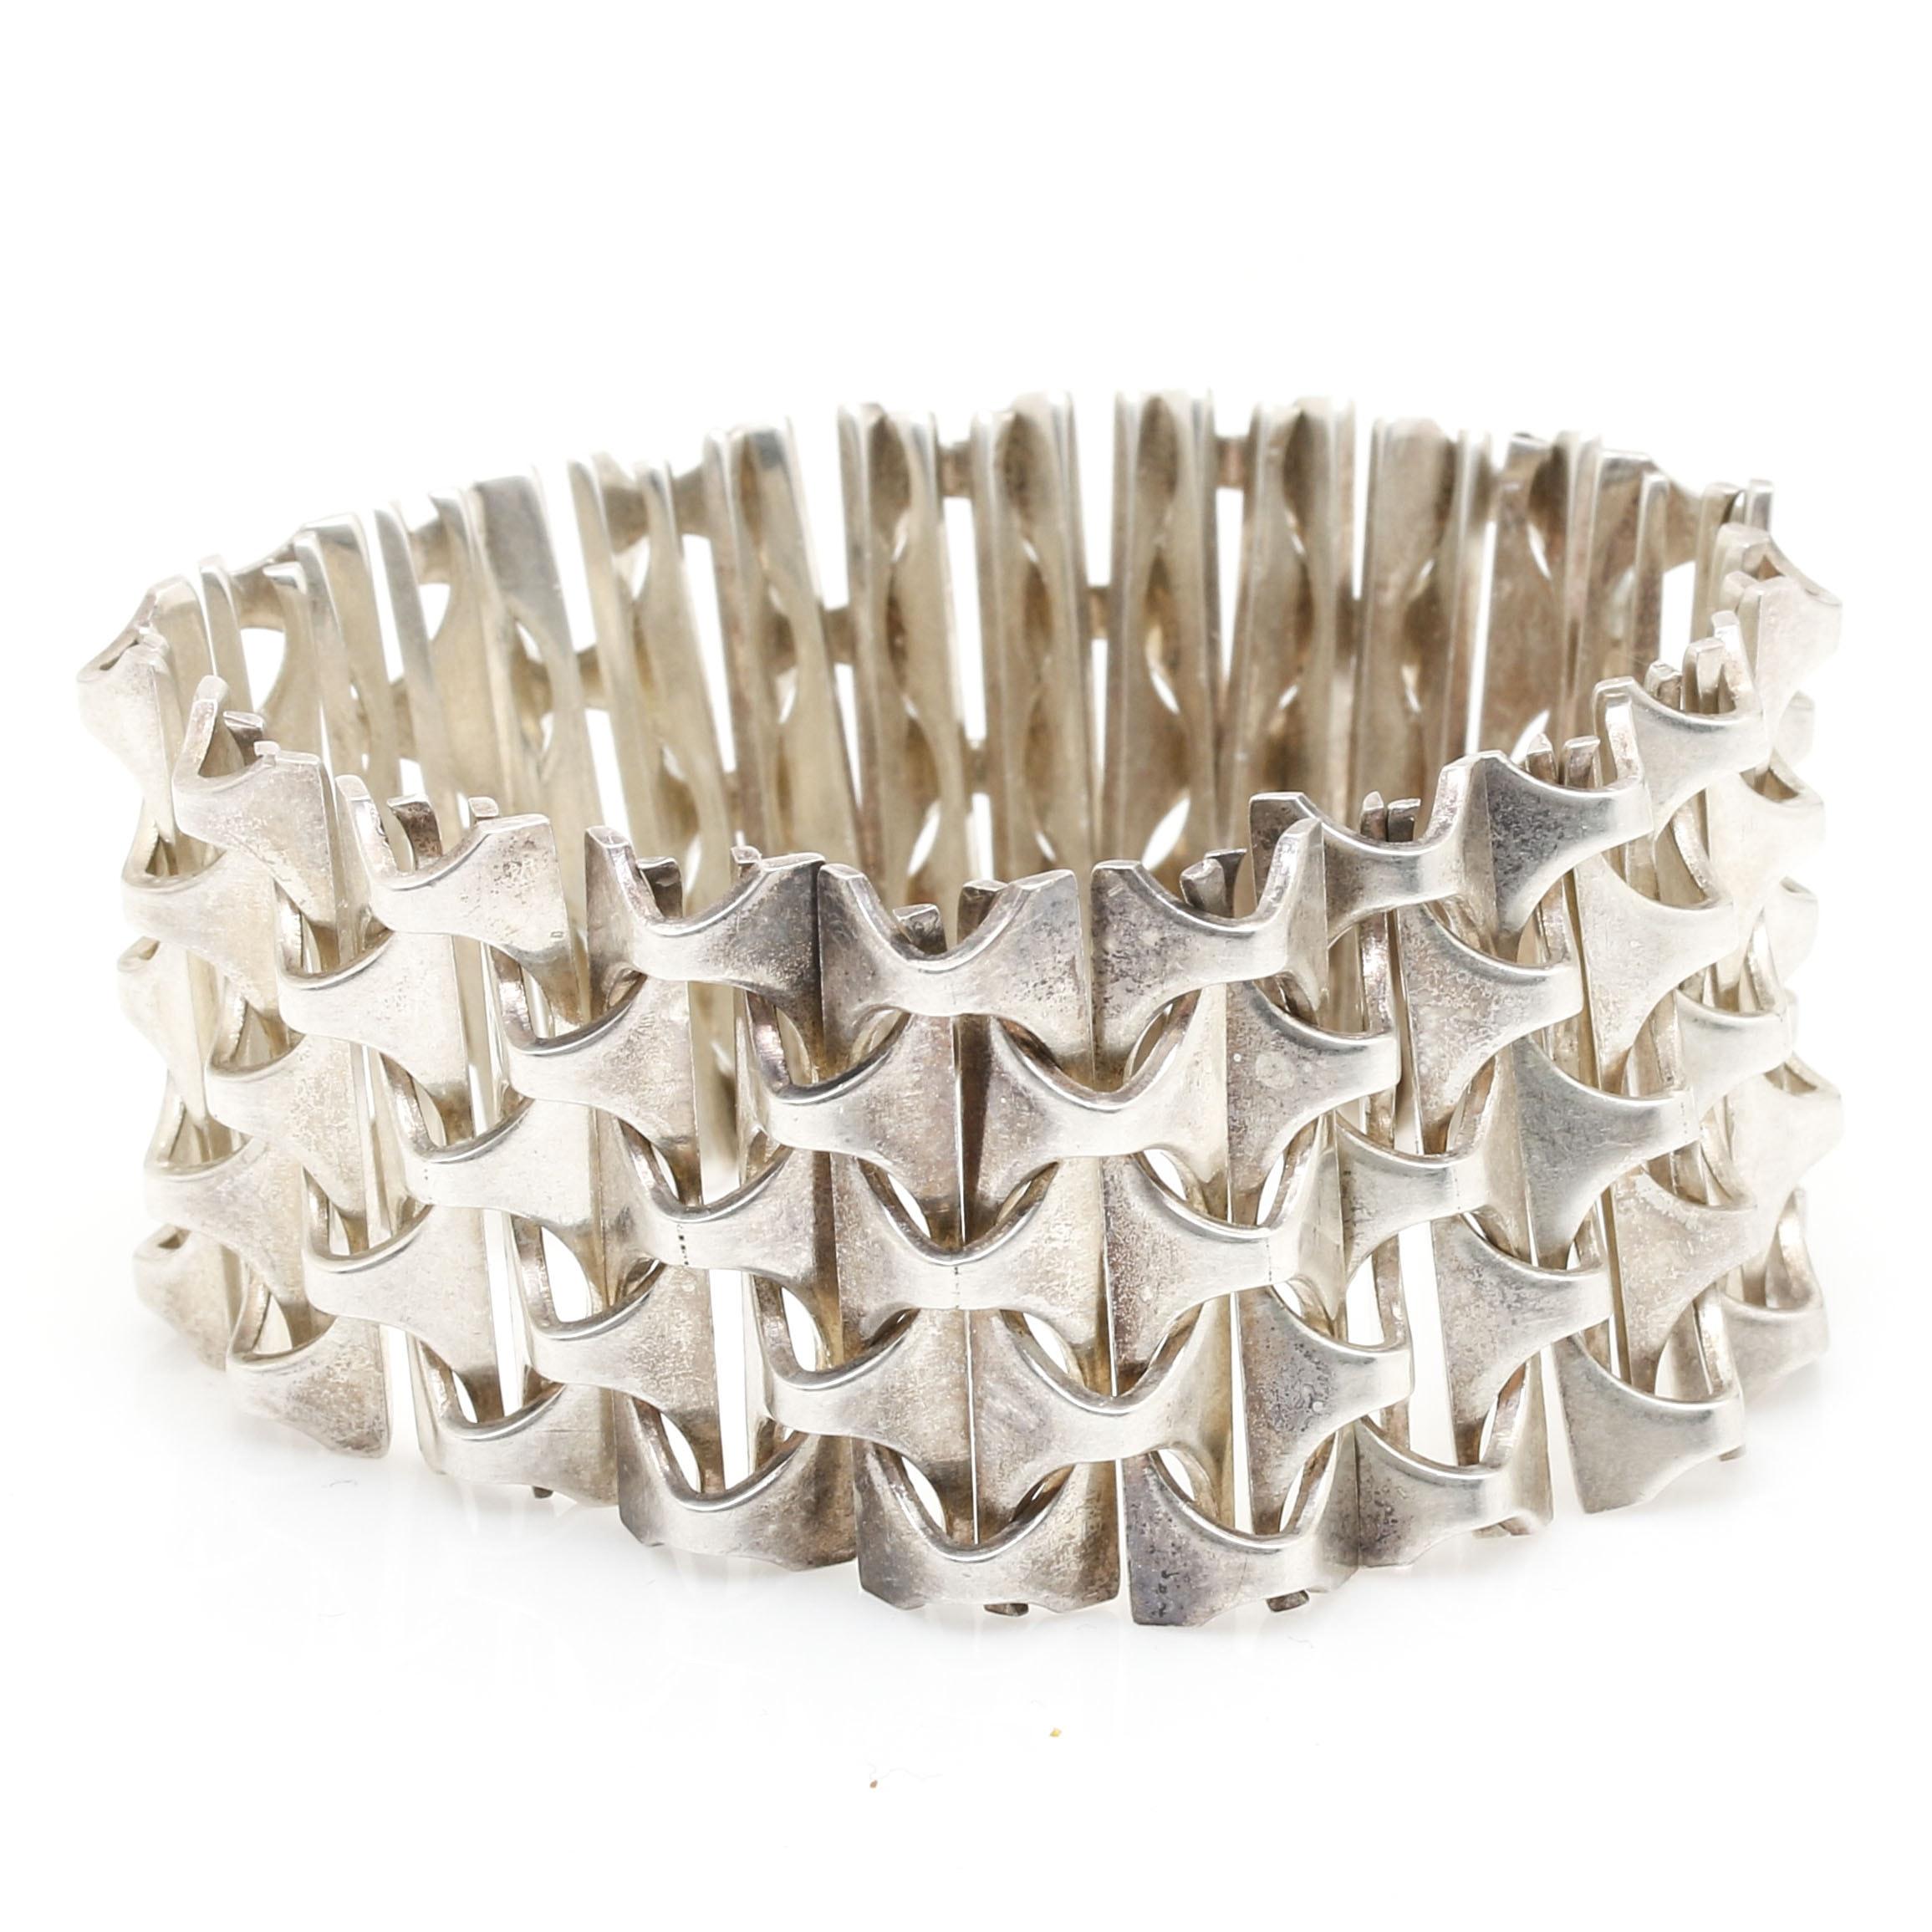 Rey Urban Sterling Silver Modernist Bracelet